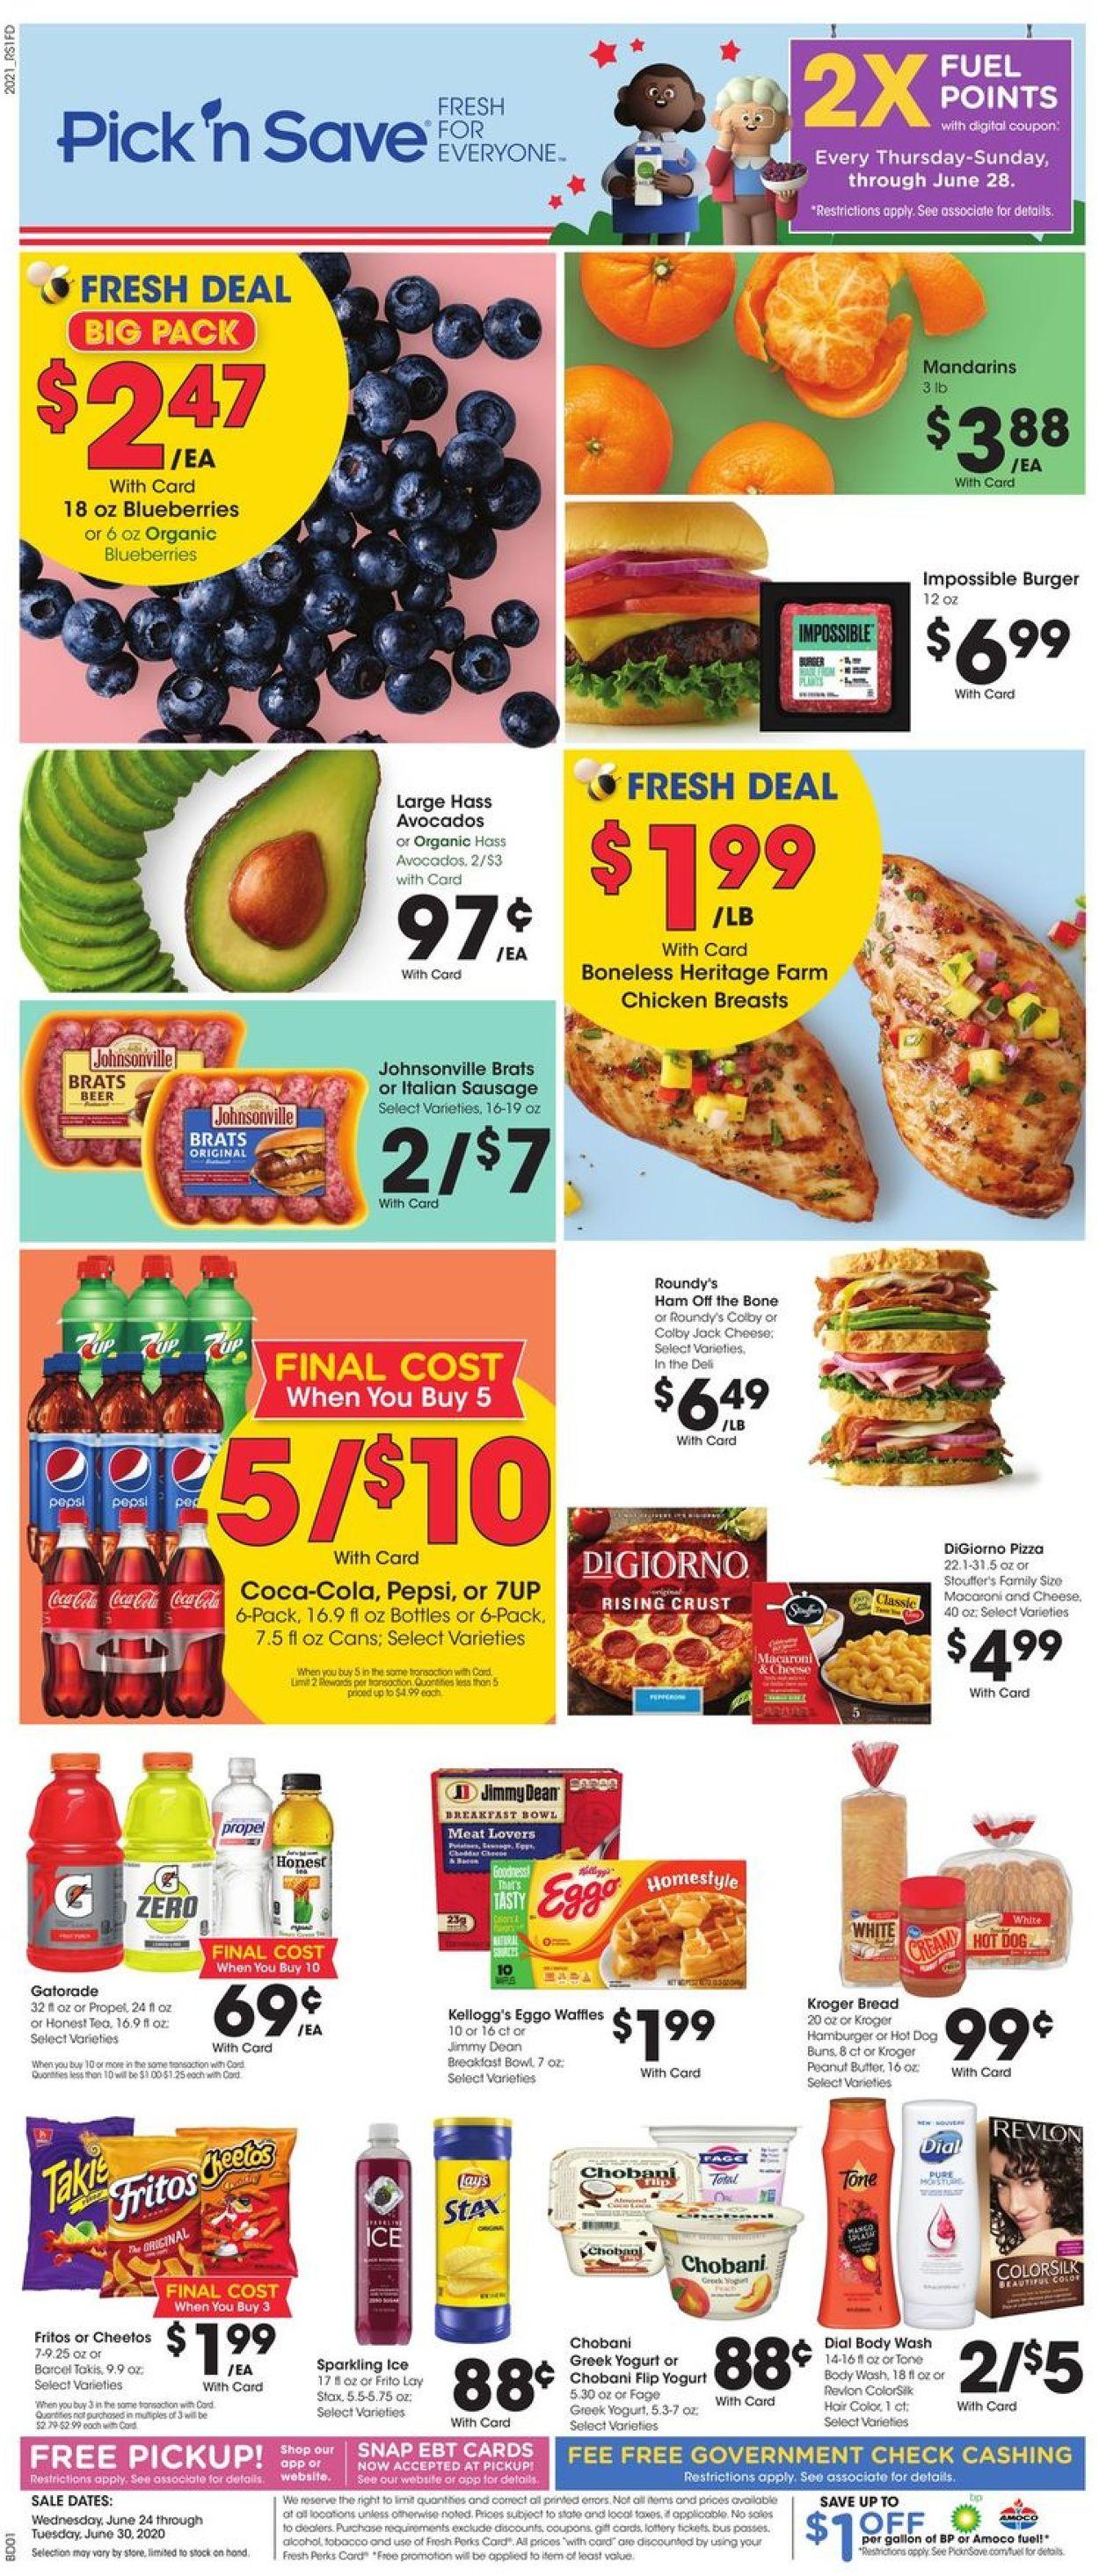 Pick 'n Save Weekly Ad Circular - valid 06/24-06/30/2020